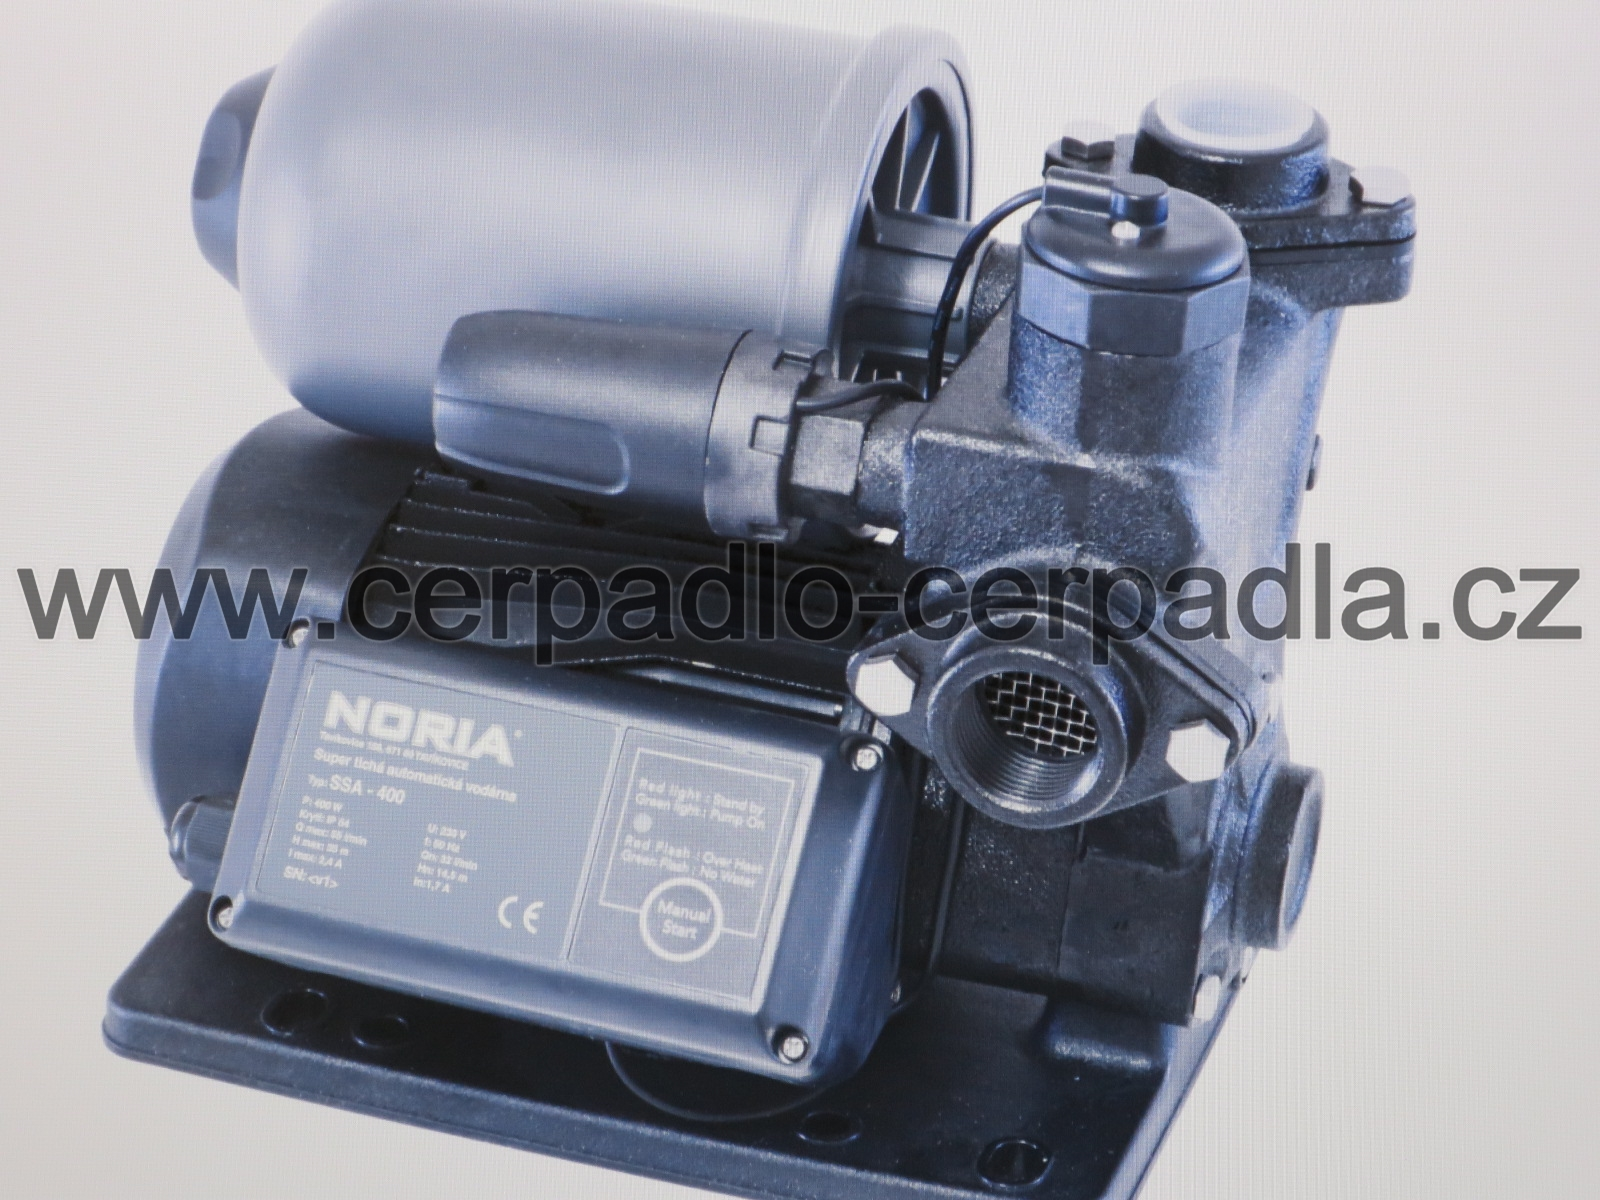 NORIA SSA-600, čerpadlo 200160 (230V, super tichá automatická vodárna, SSA-600, záruka 3 roky, DOPRAVA ZDARMA)